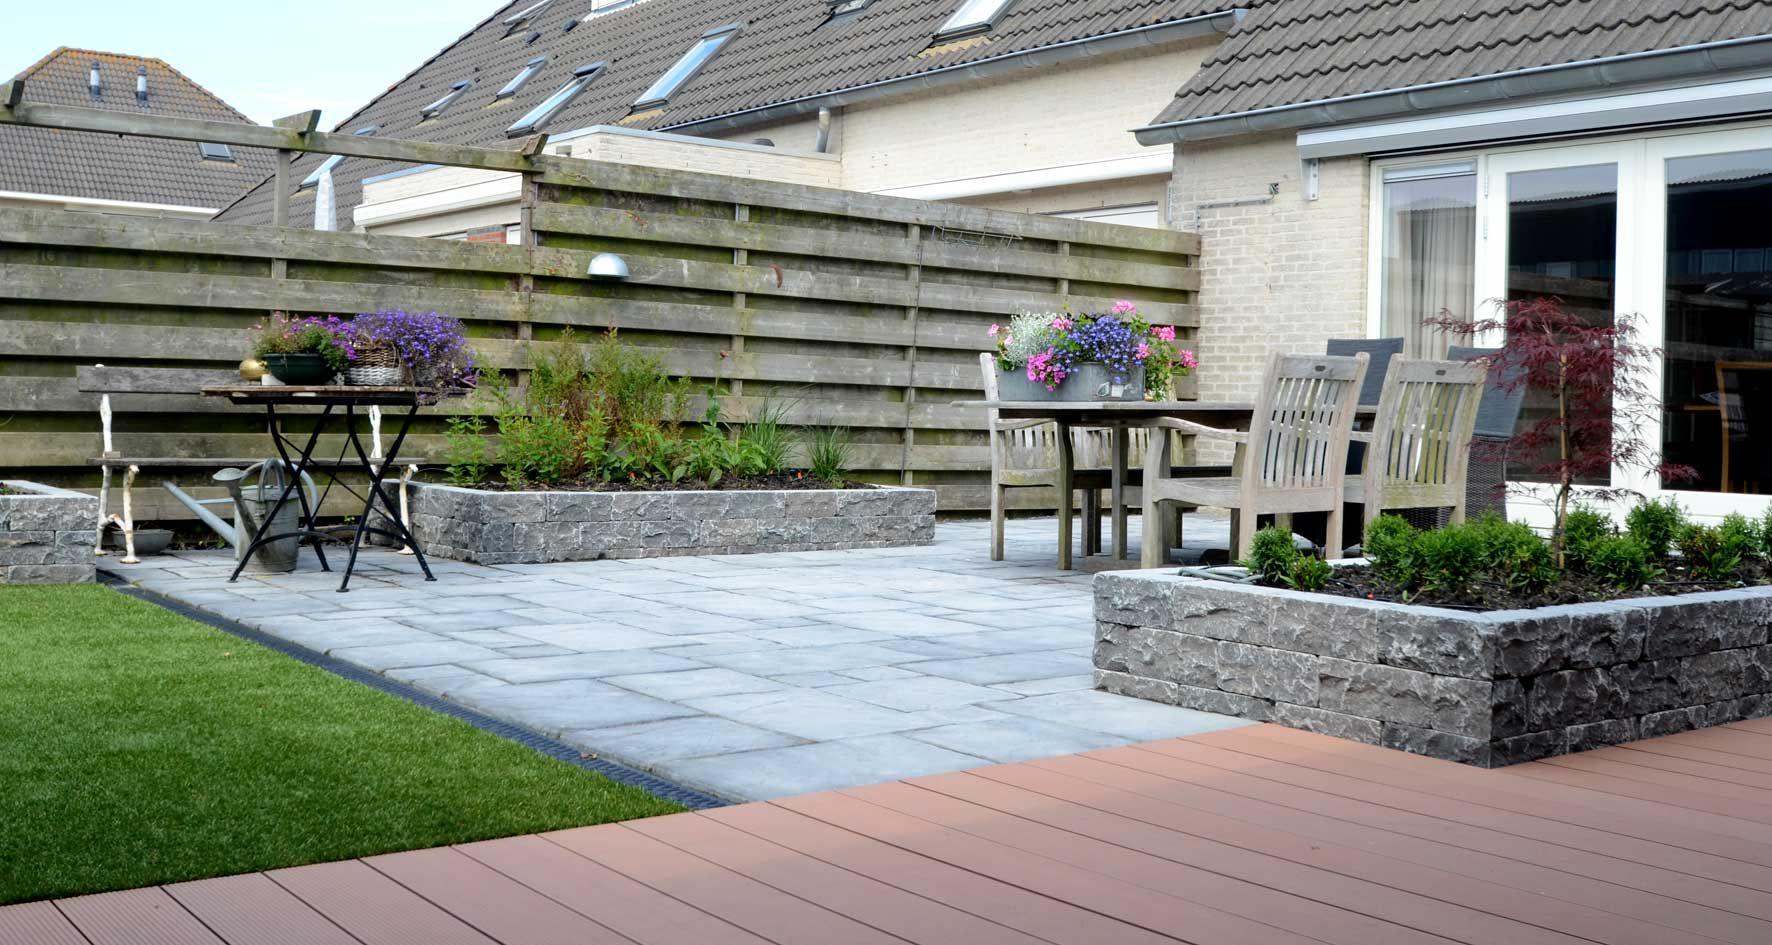 Drainage Tegels 50x50.Sierbestrating Berkhout Donker Wit Tuintechniek